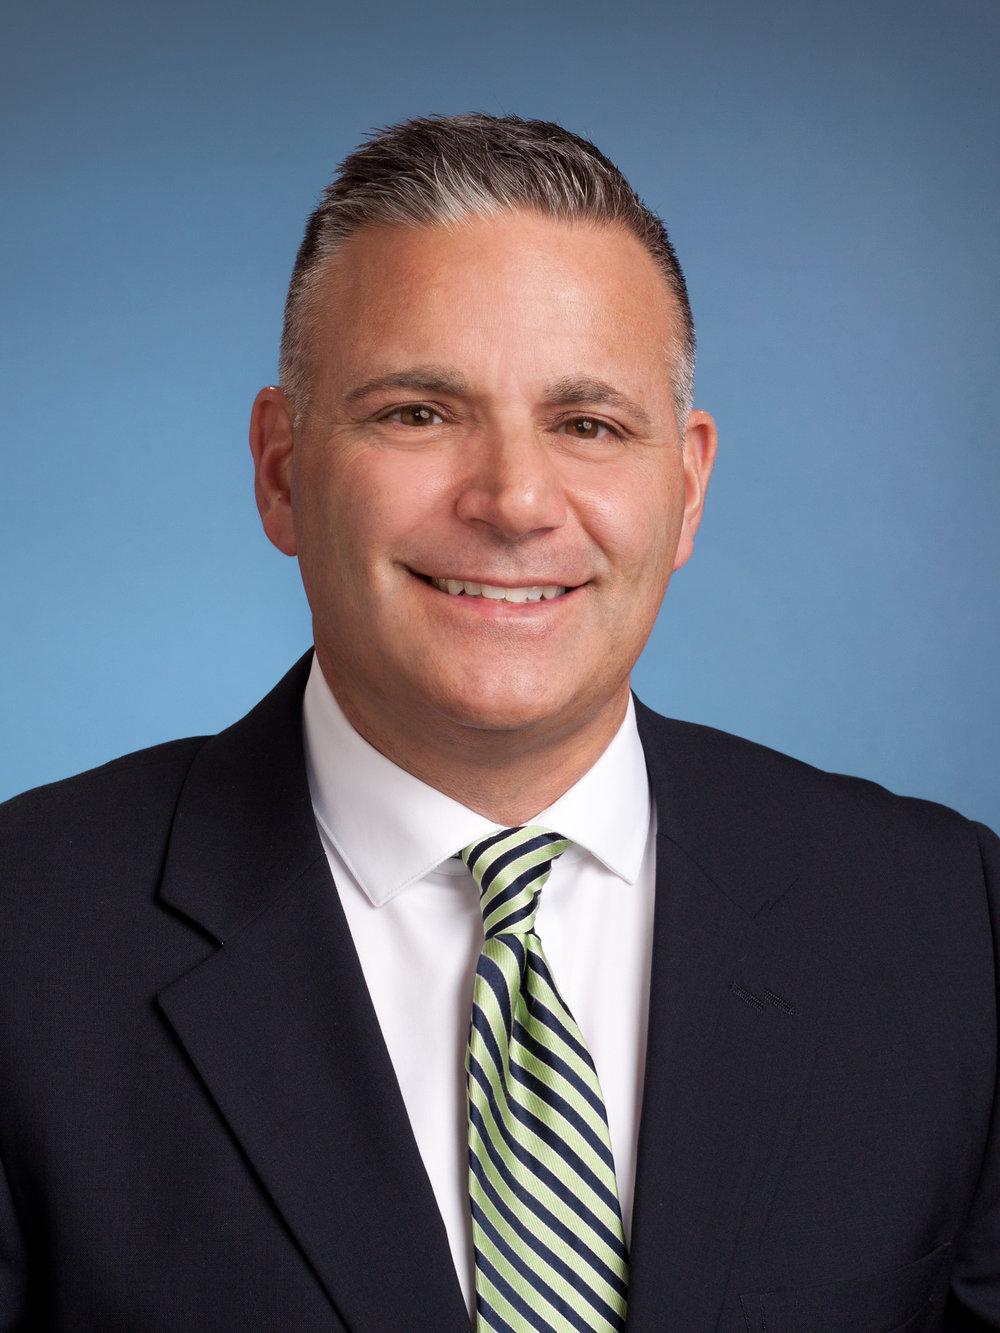 Joe DiBitetto - Director of Business Development